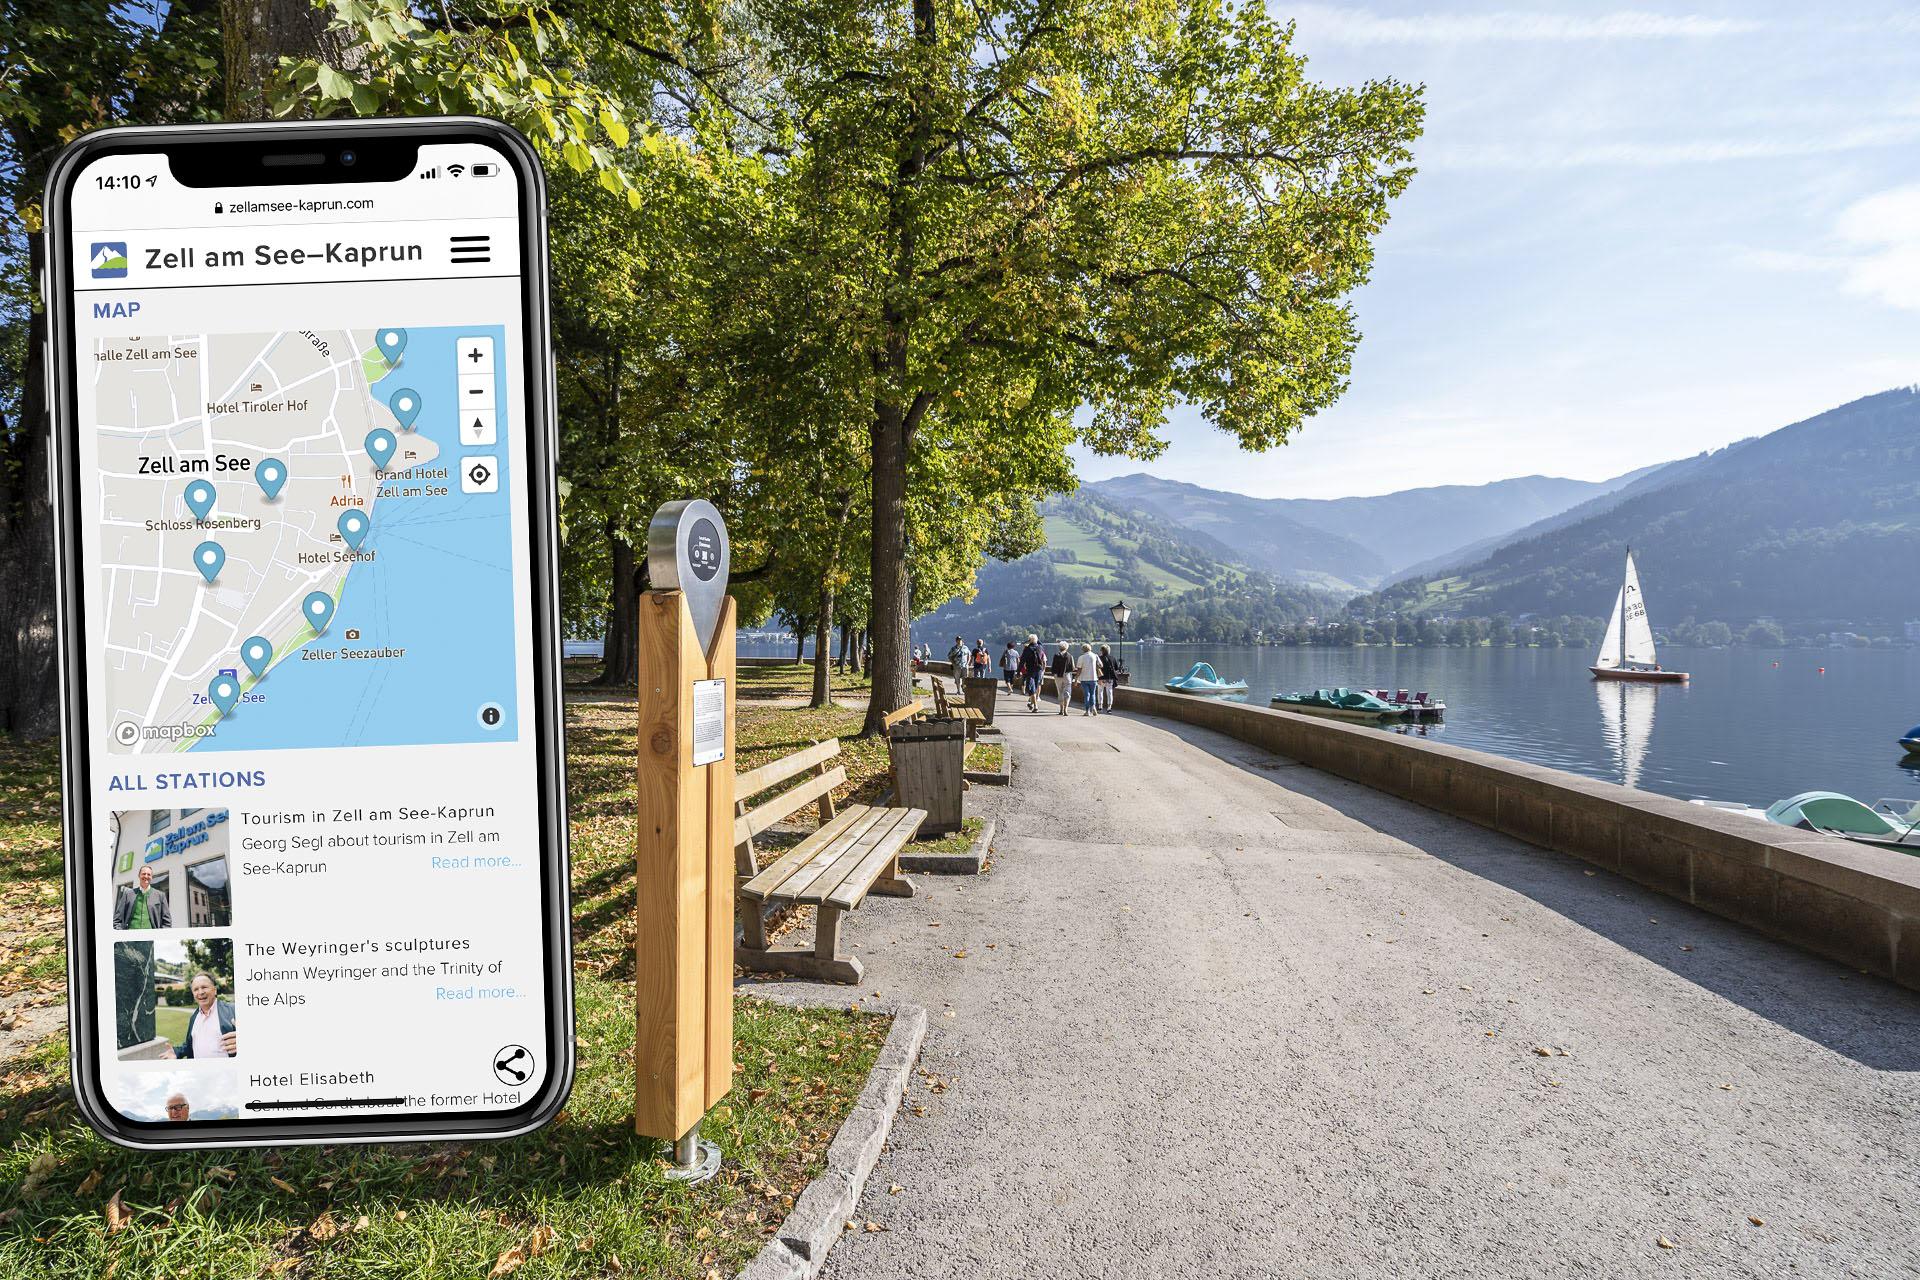 Mobile information system in Zell am See-Kaprun